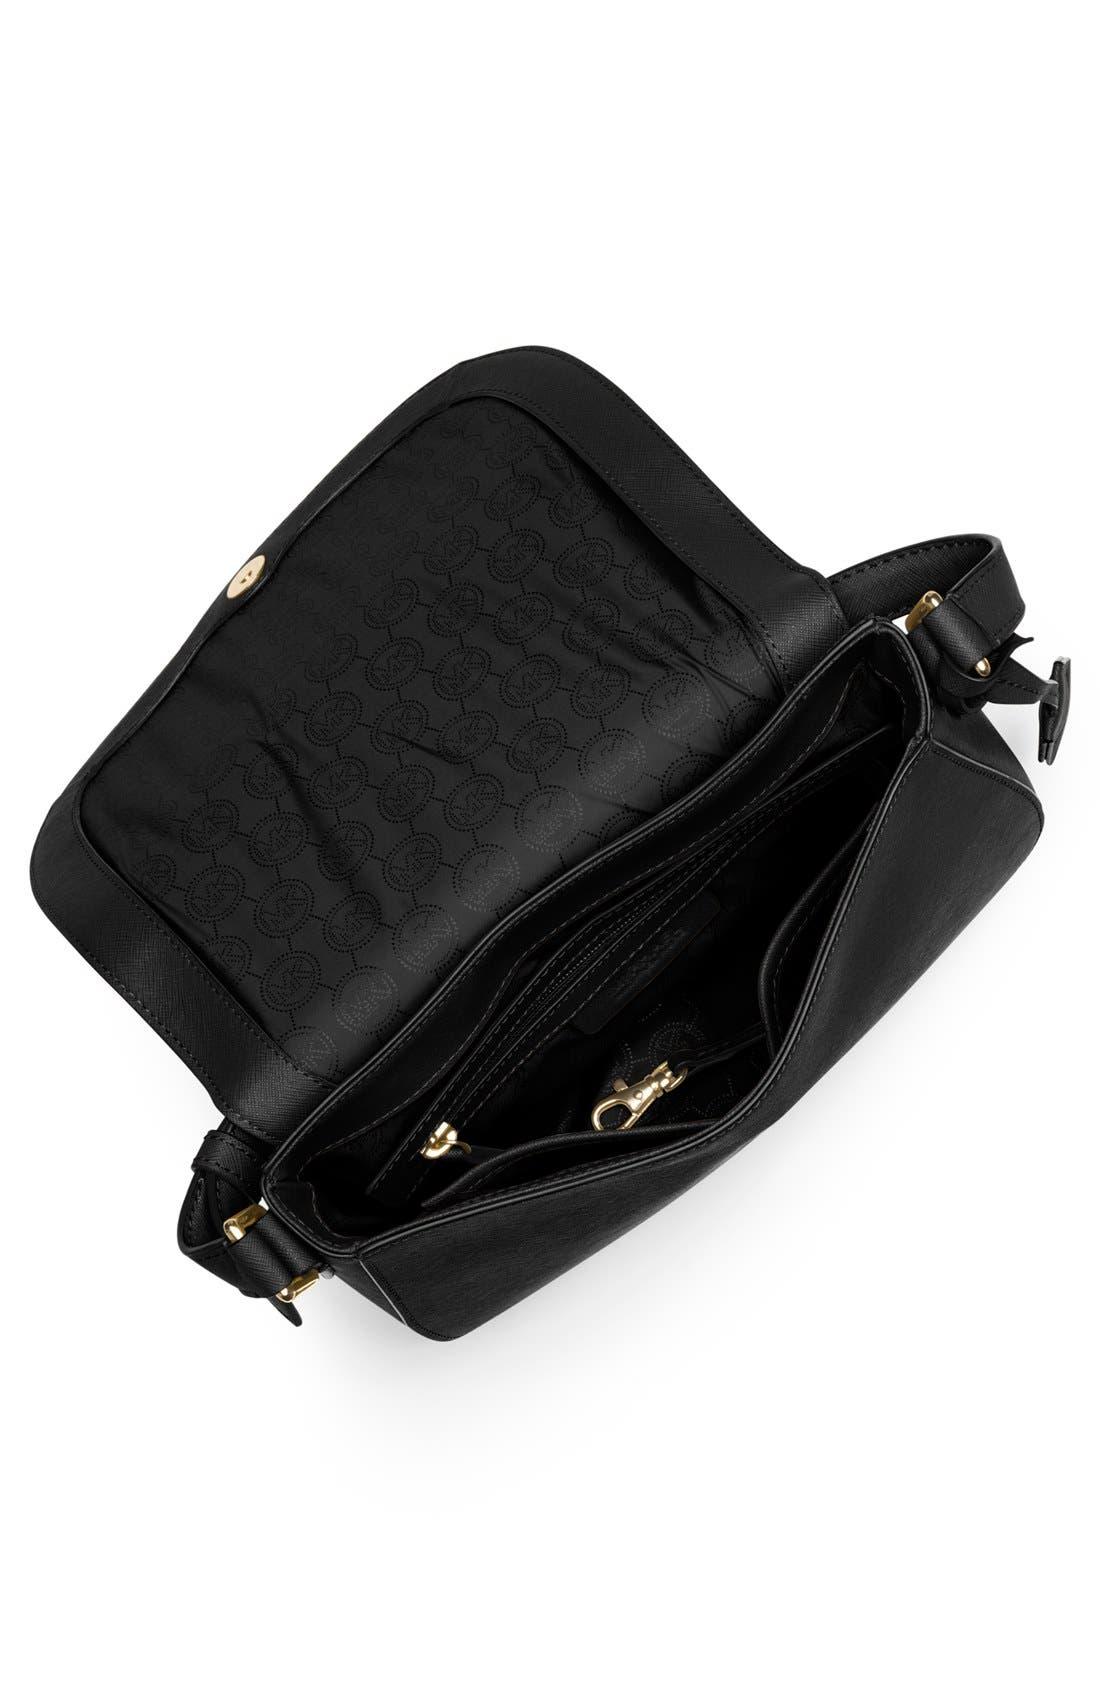 Alternate Image 2  - MICHAEL Michael Kors 'Large' Saffiano Leather Messenger Bag